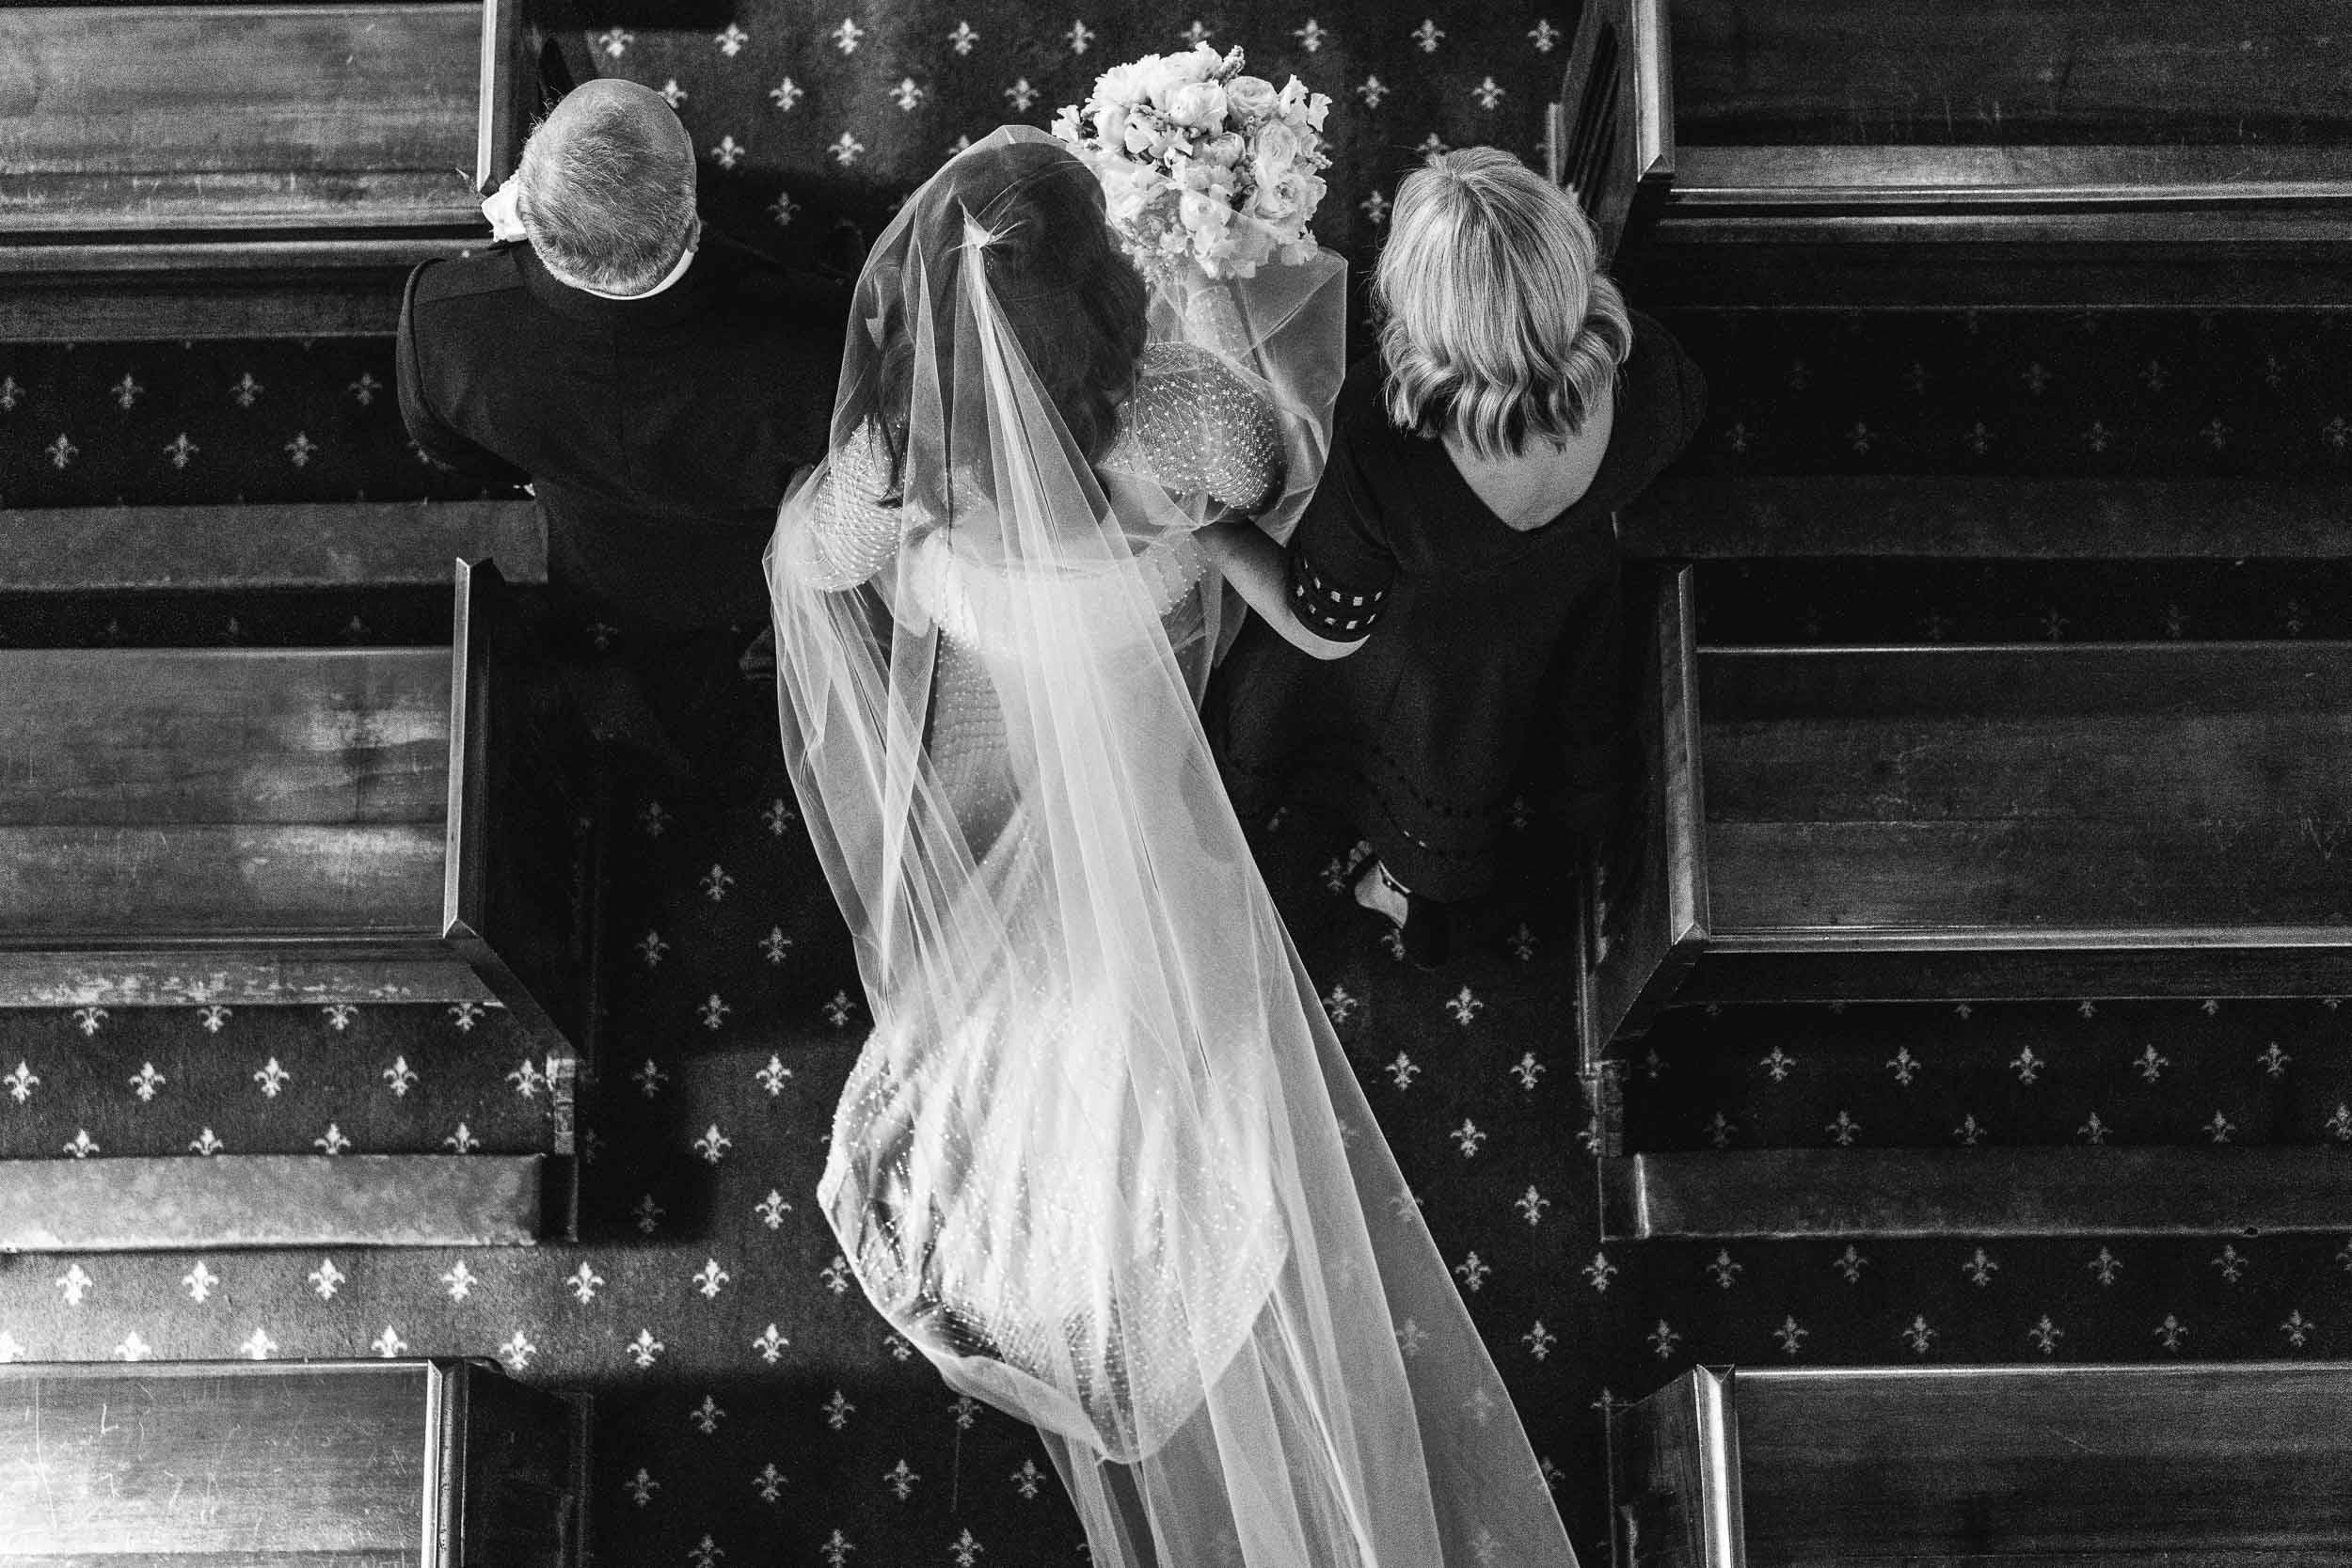 Kas-Richards-Wedding-Photographer-Melbourne-City-Wedding-Alto-Event-Space-Jane-Hill-Bridal-Gown-27.jpg